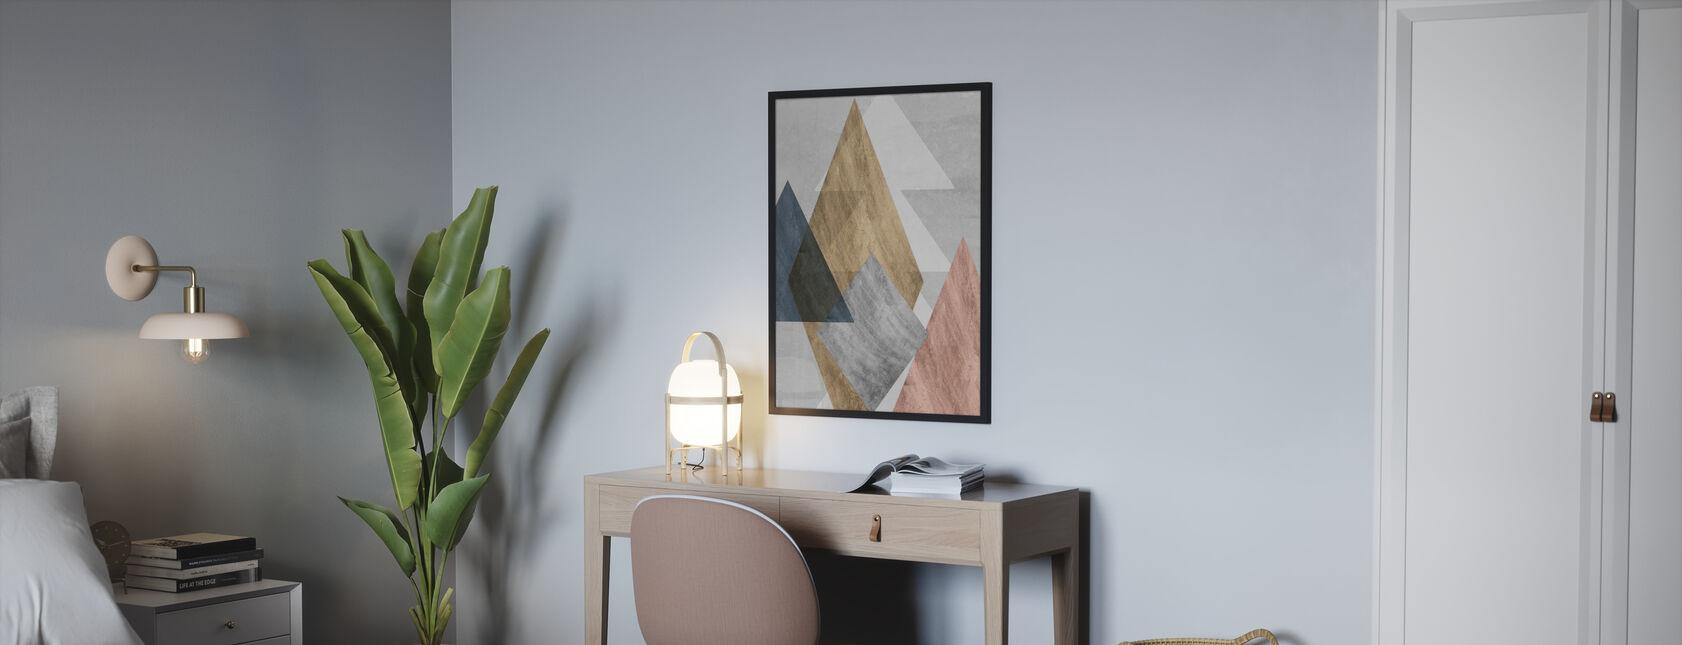 Peaks - Poster - Schlafzimmer